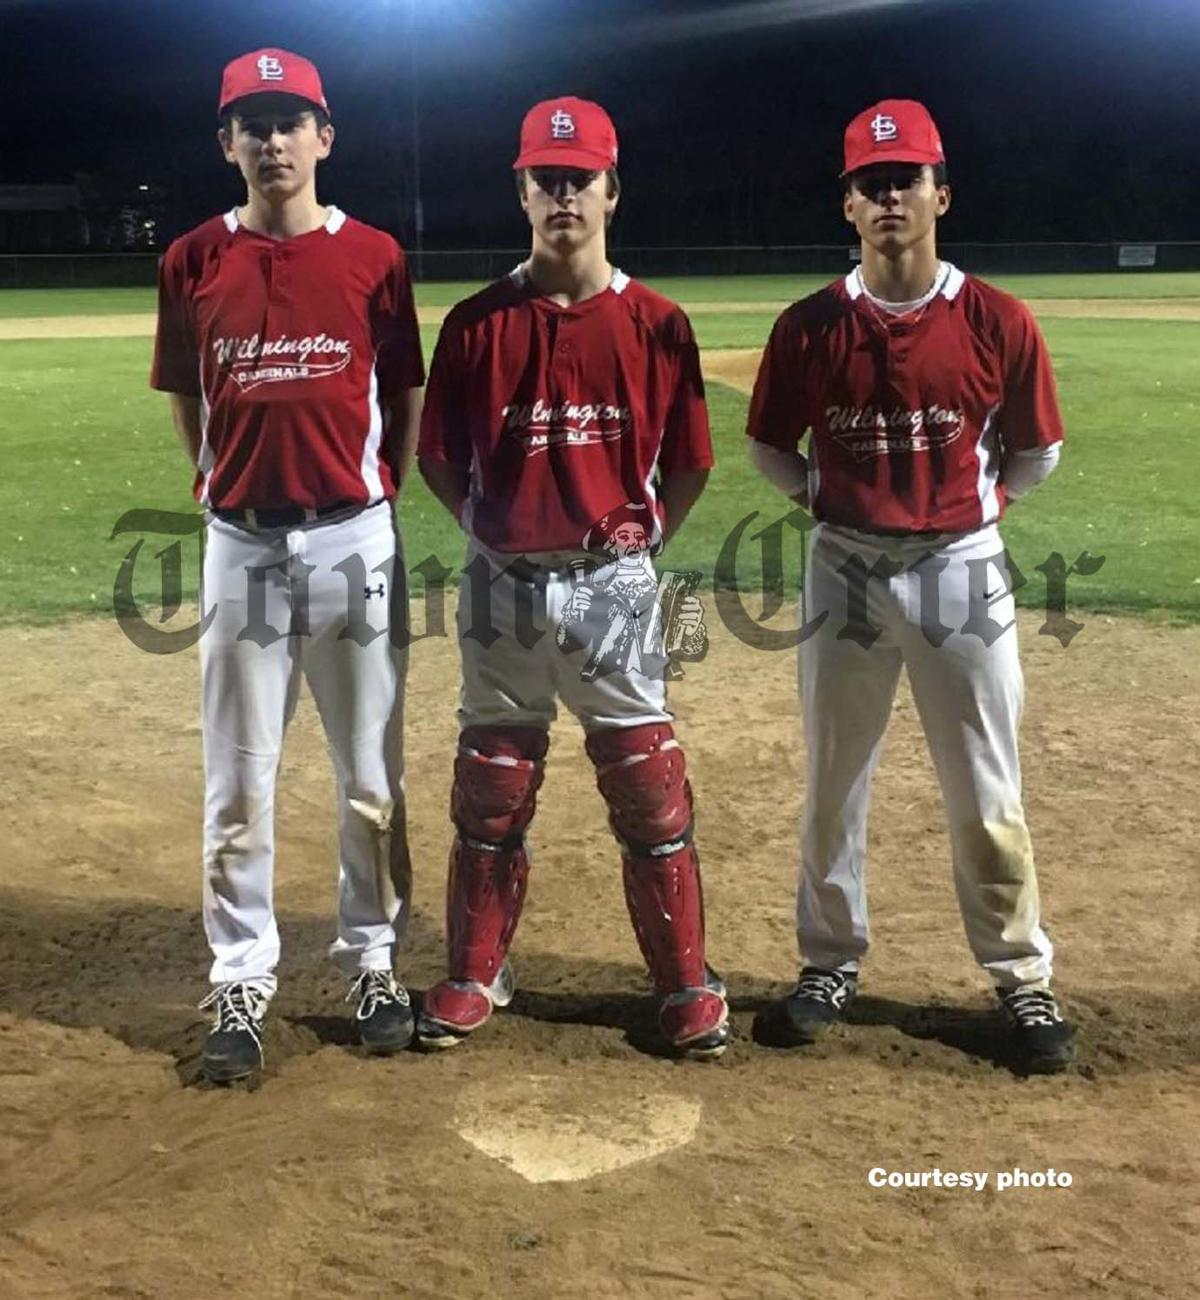 Tyler Fenton, Ben McEwen and Nick Benson